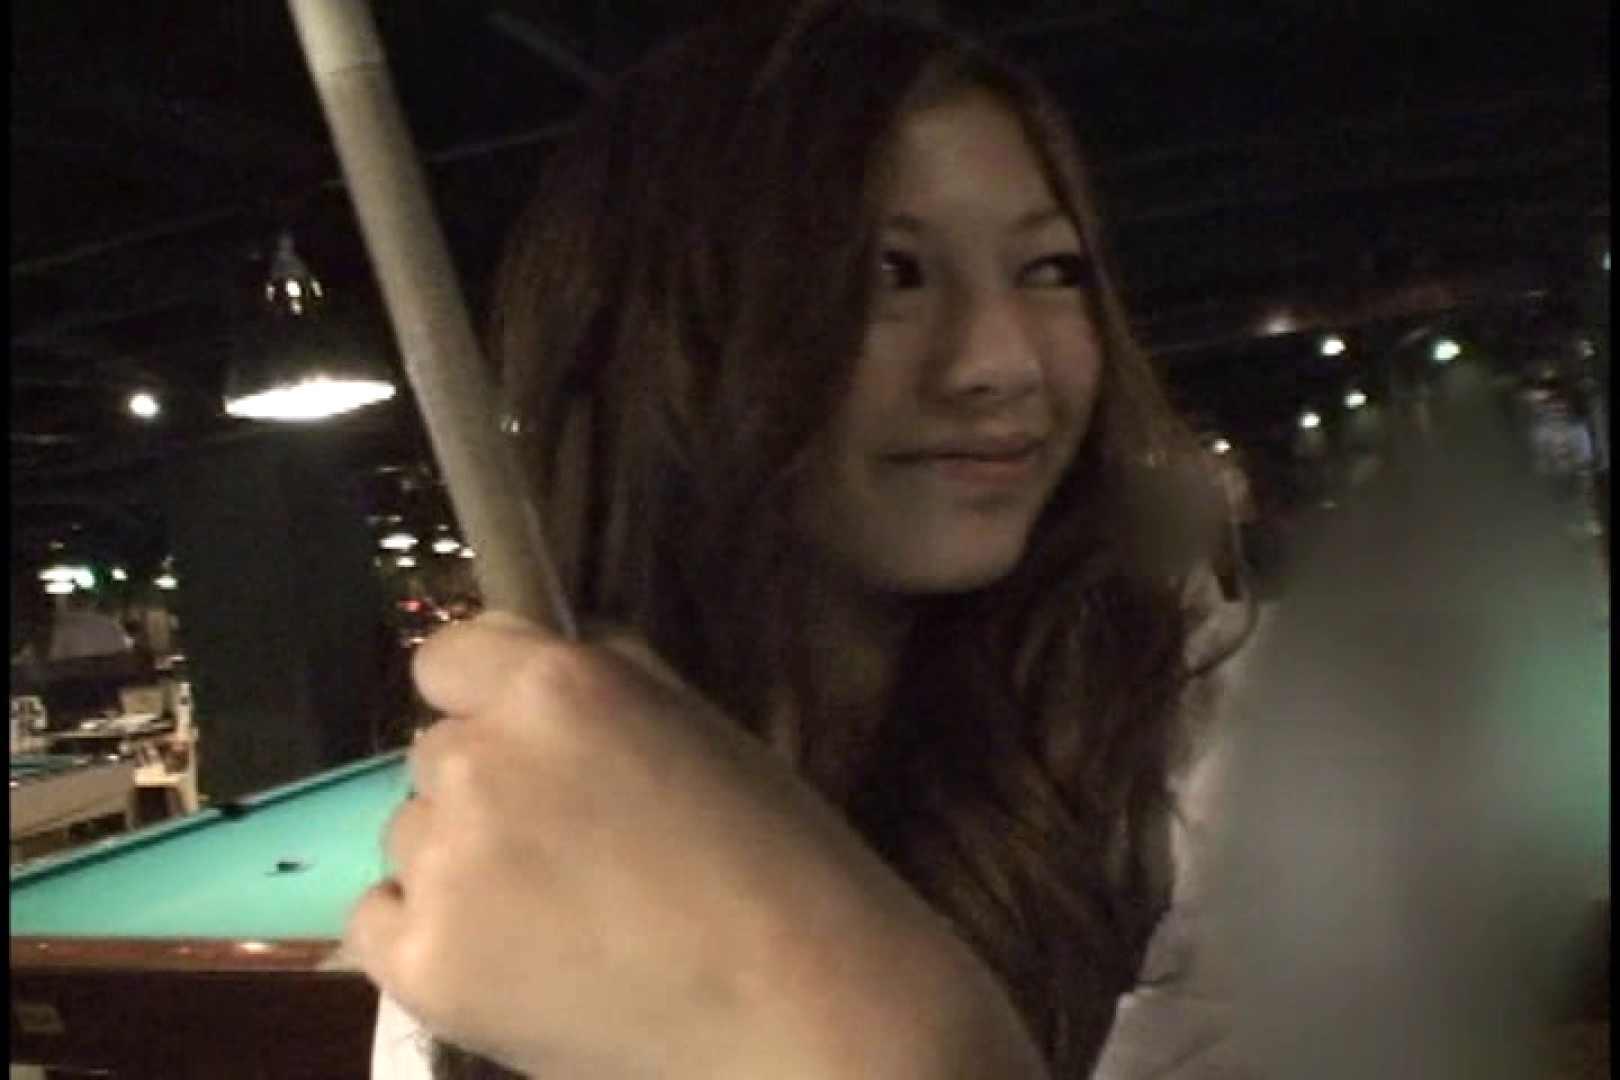 JDハンター全国ツアー vol.032 後編 女子大生のエロ動画 | 0  83PIX 27